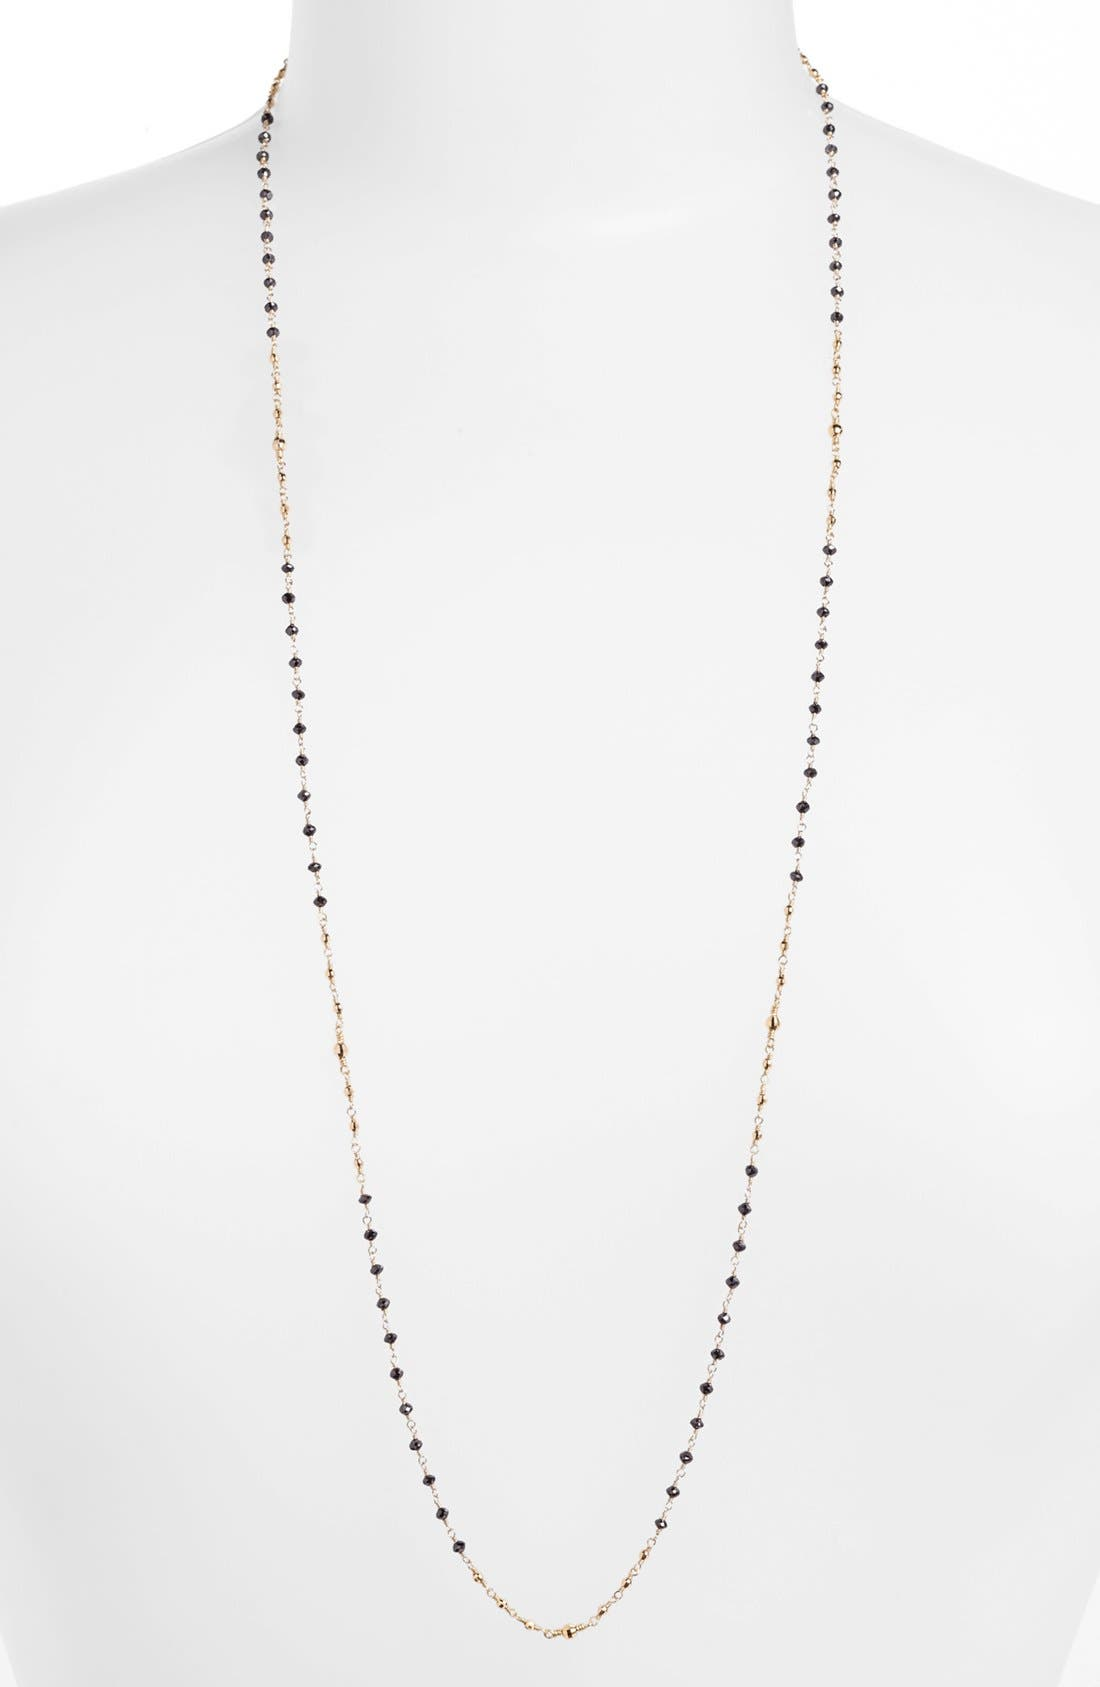 Main Image - Mizuki 'Cut Beads' Long Black Diamond Station Necklace